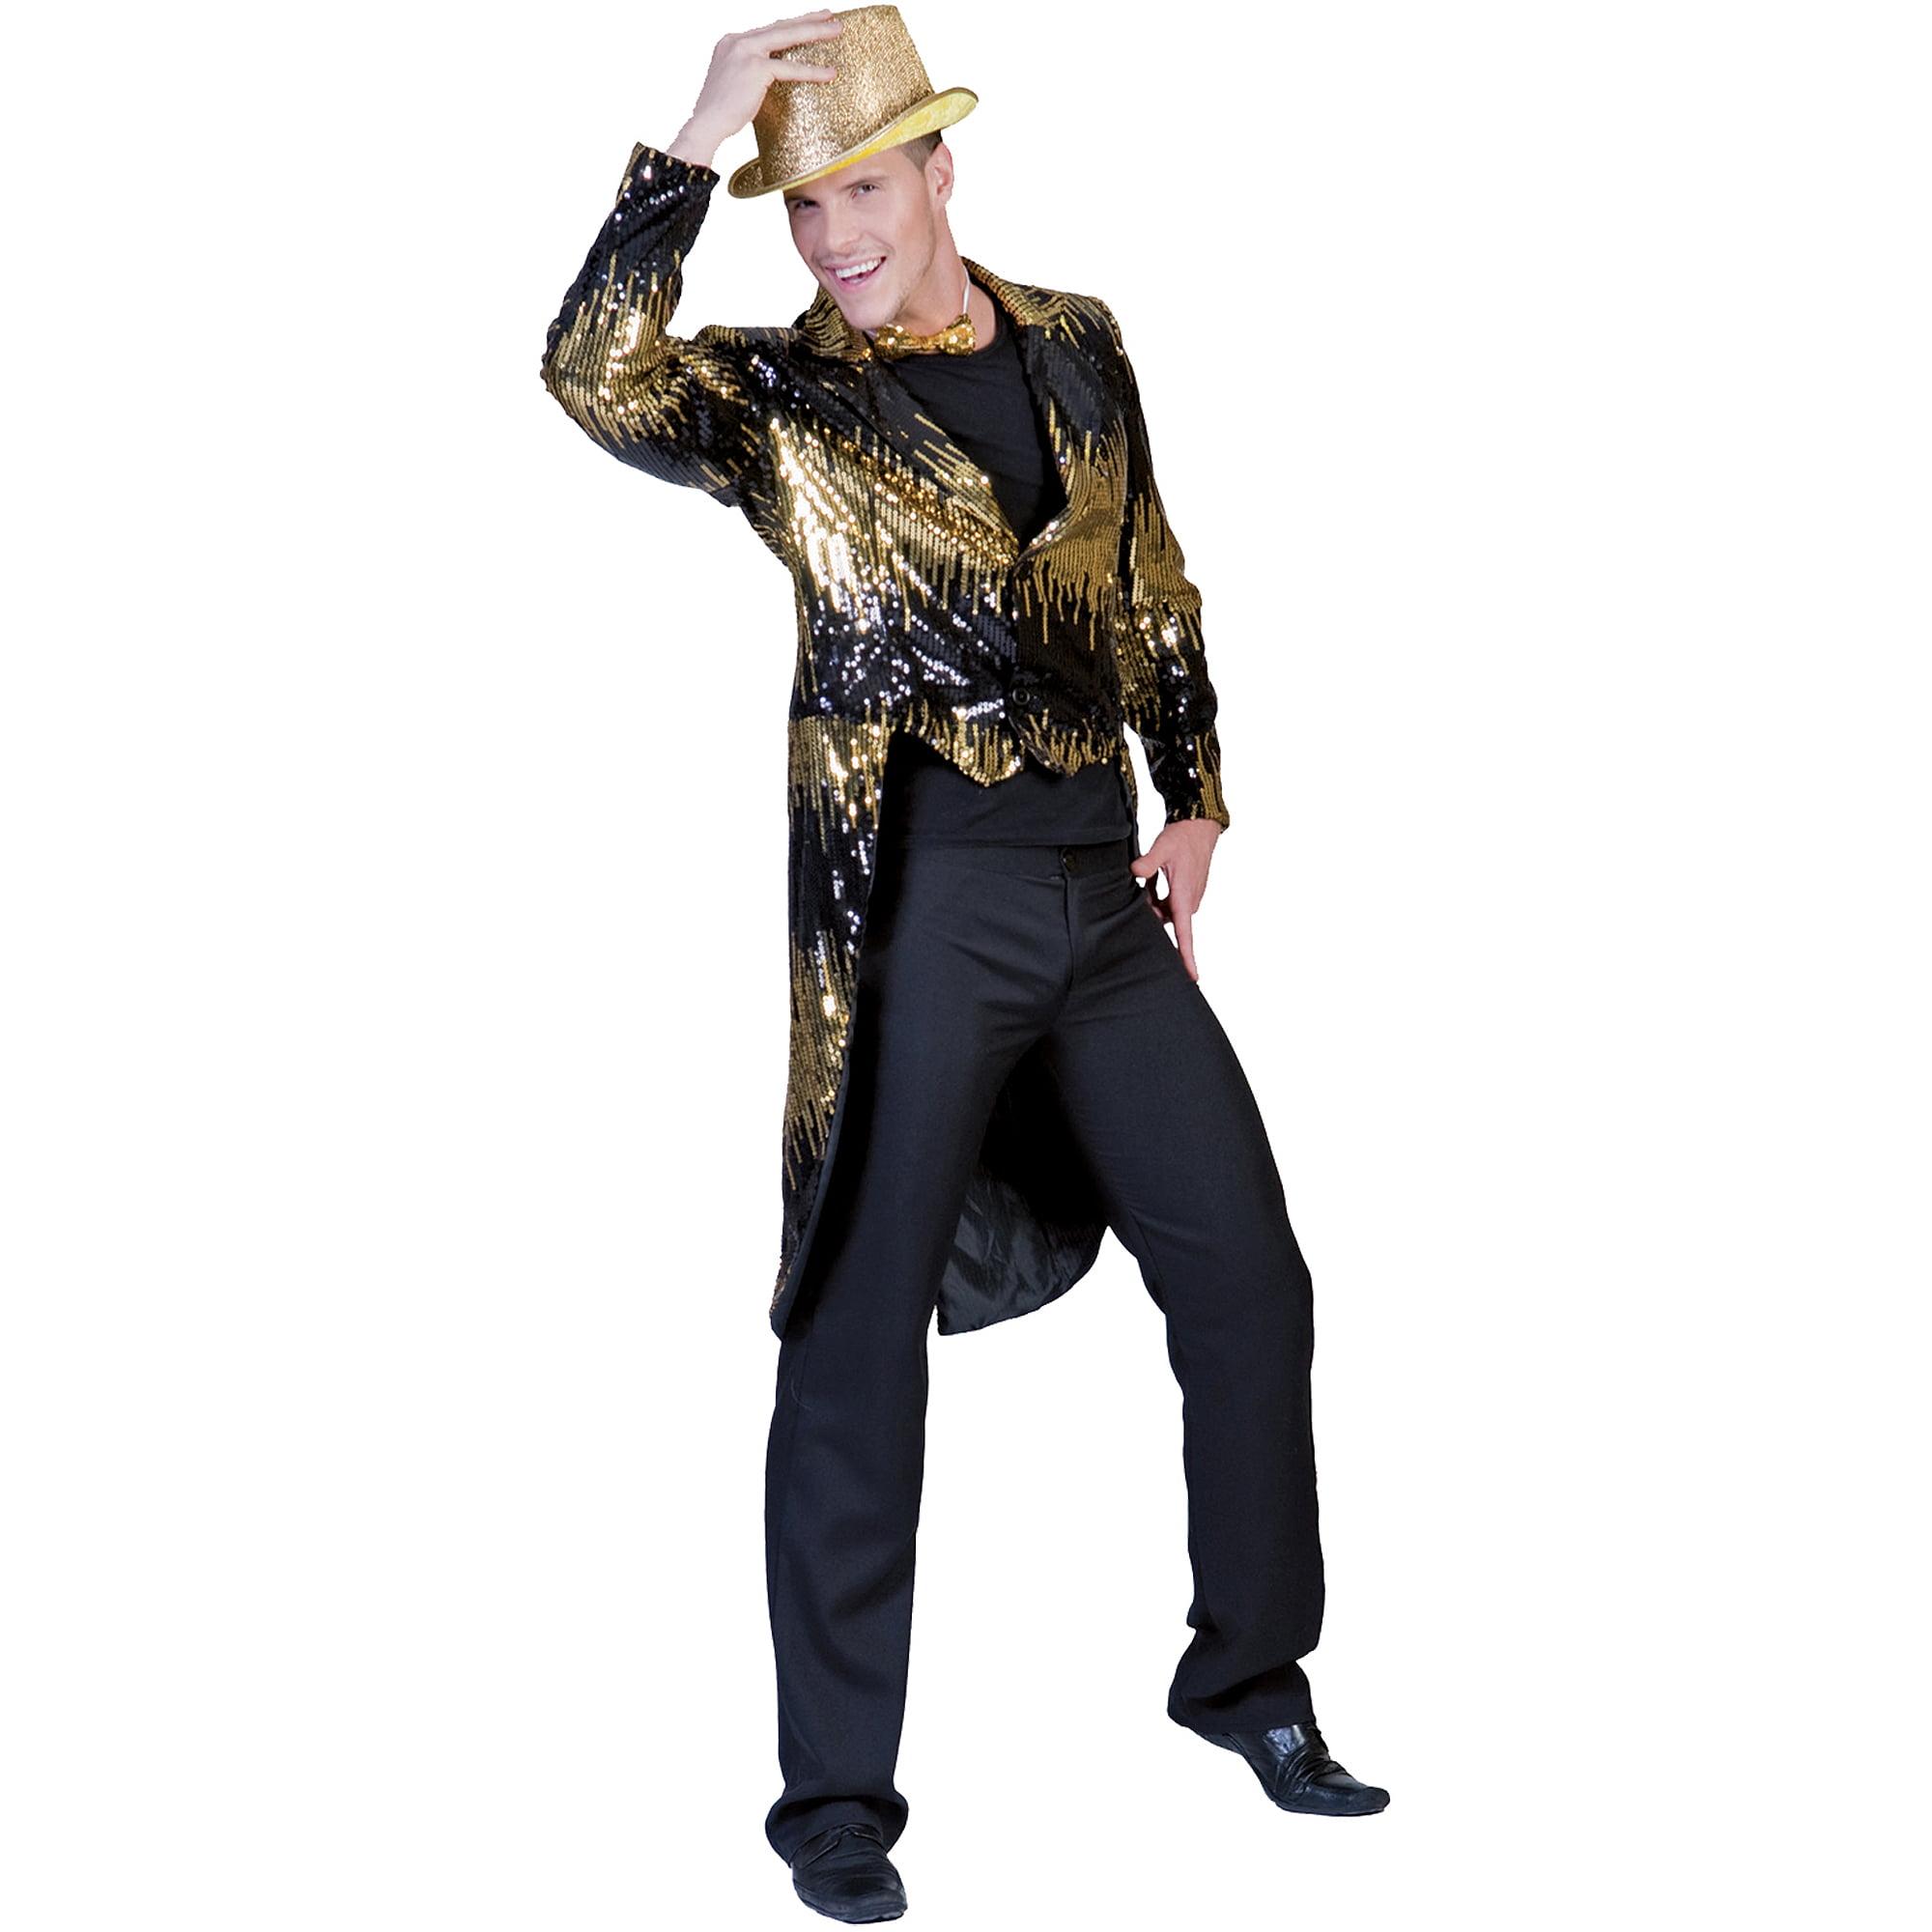 Gold Glitter Tailcoat Adult Halloween Costume